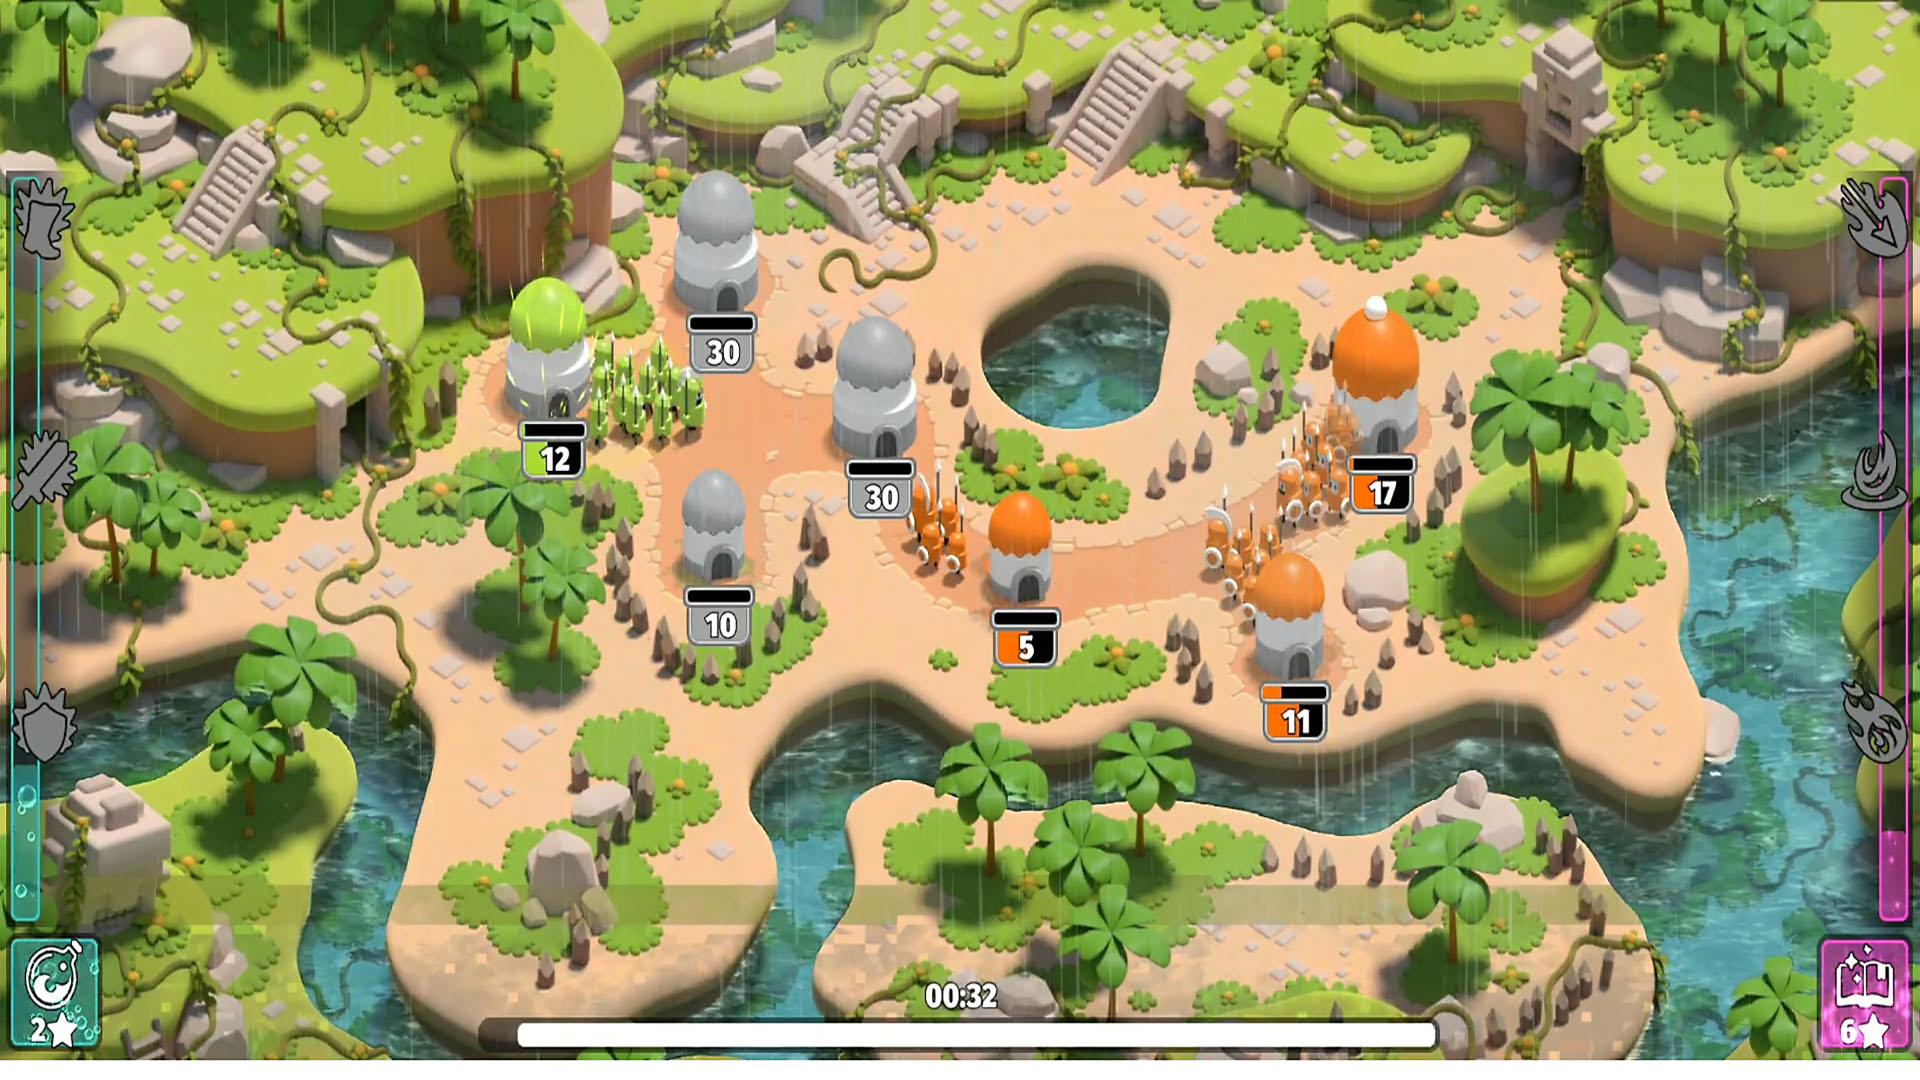 BattleTime 2 - Real Time Strategy Offline Game captura de pantalla 1